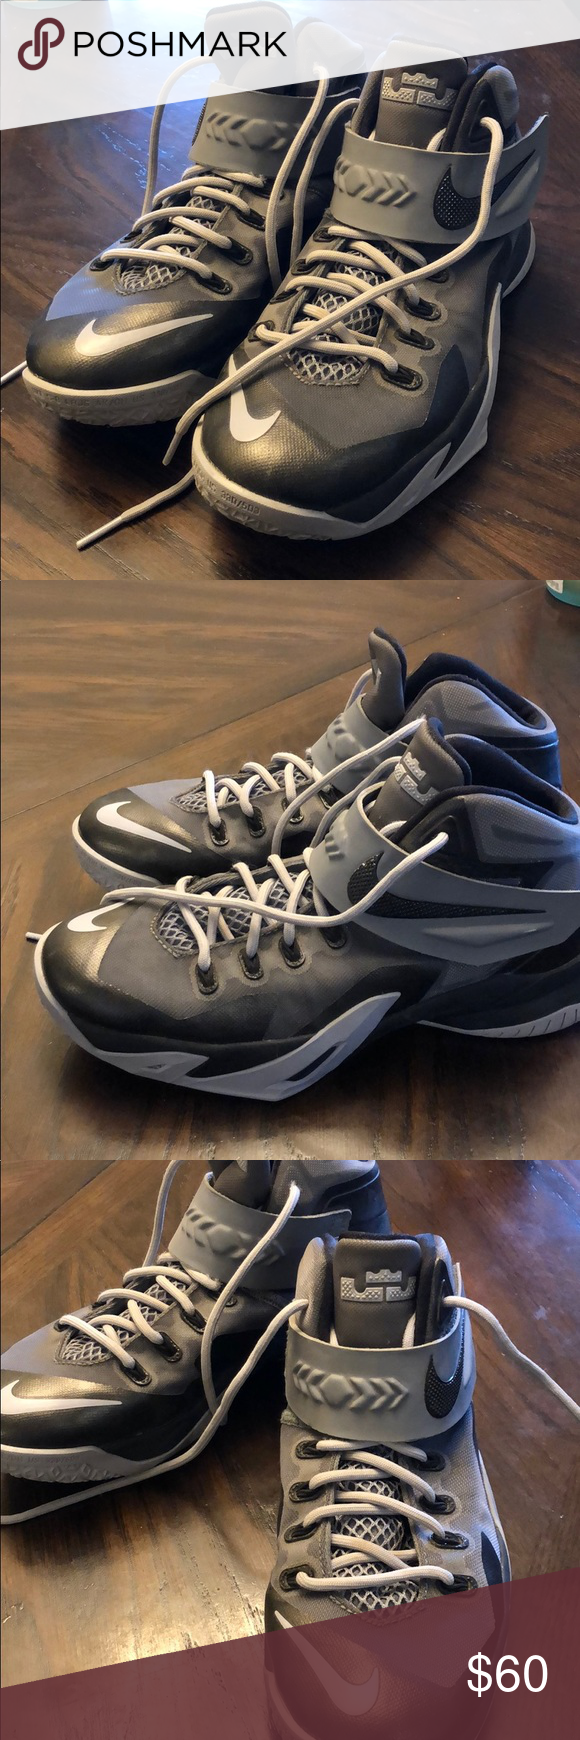 e77e9d137ae Nike Soldier VIII 8 Kids Lebron Basketball Shoes Nike Soldier VIII 8 653645-008  Kids